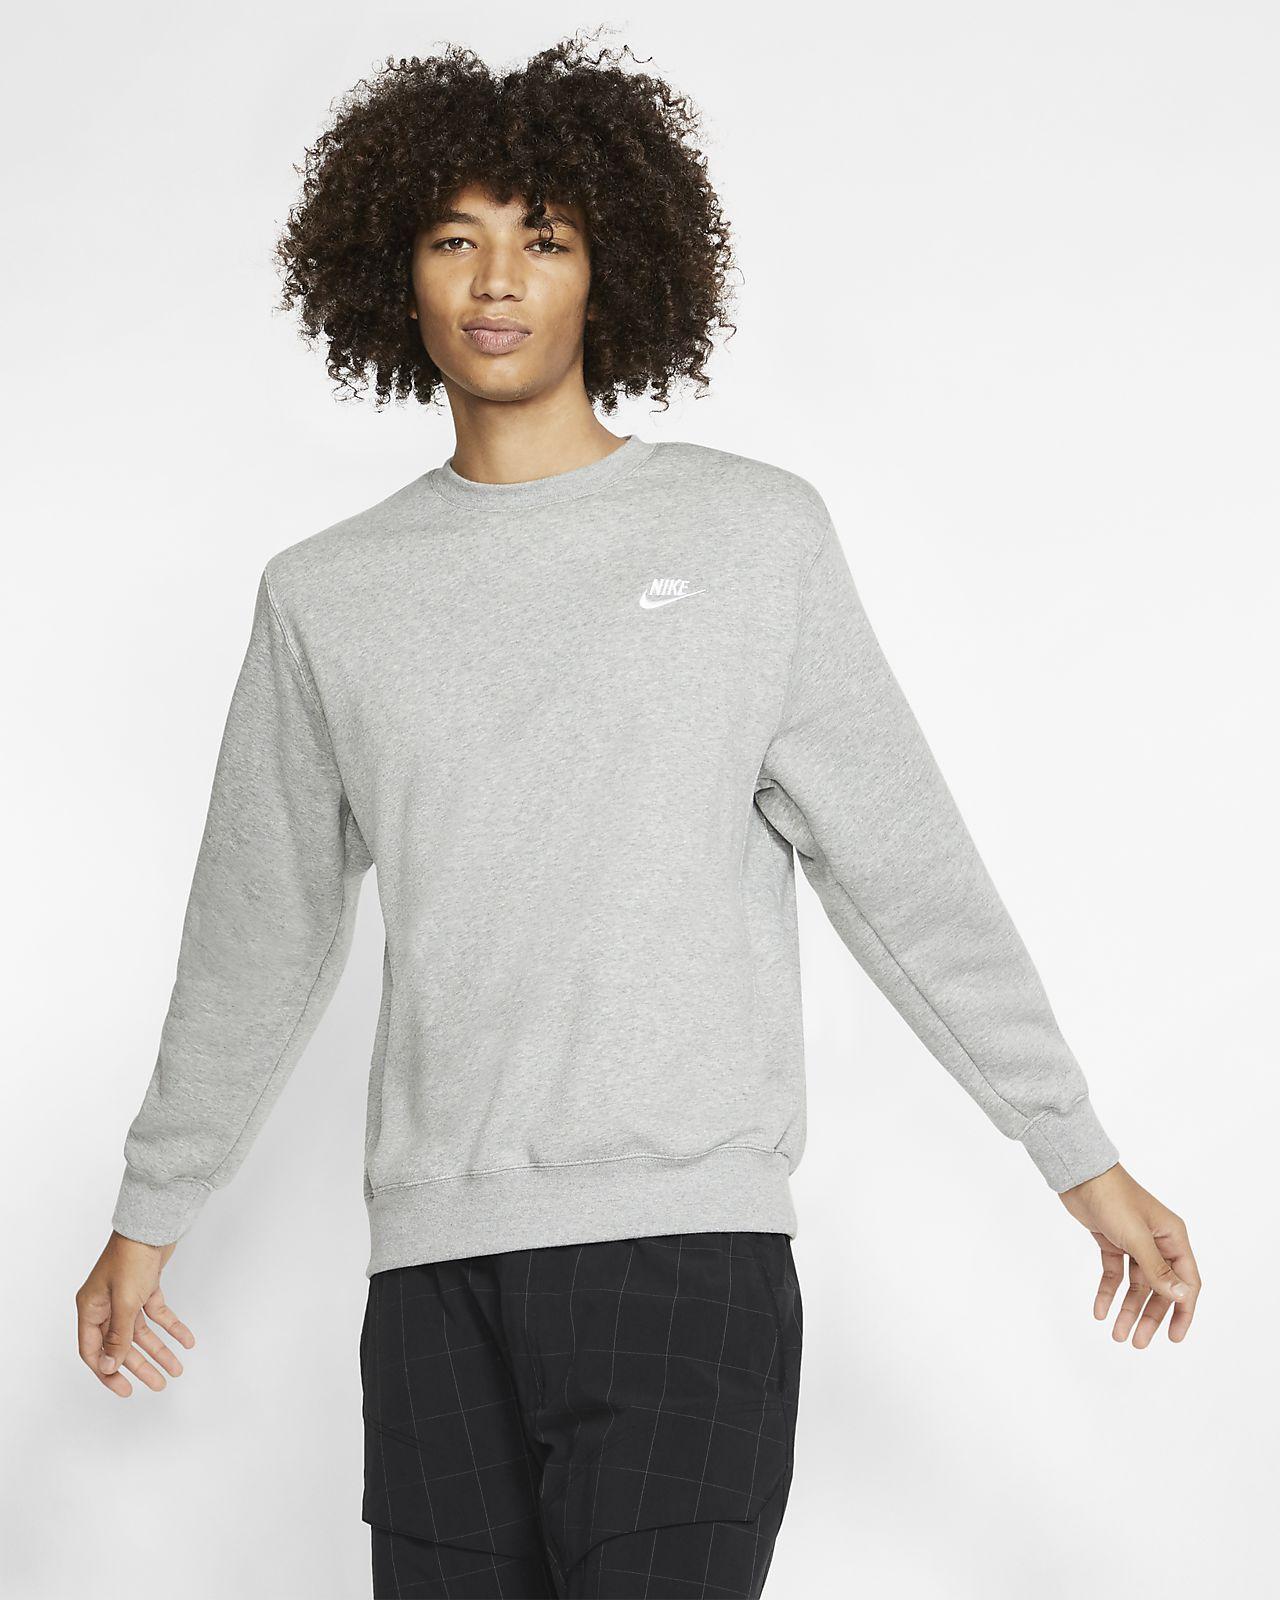 Nike Sportswear Club Fleece Crew Nike Com Nike Sportswear Fleece Shirt Sportswear [ 1600 x 1280 Pixel ]